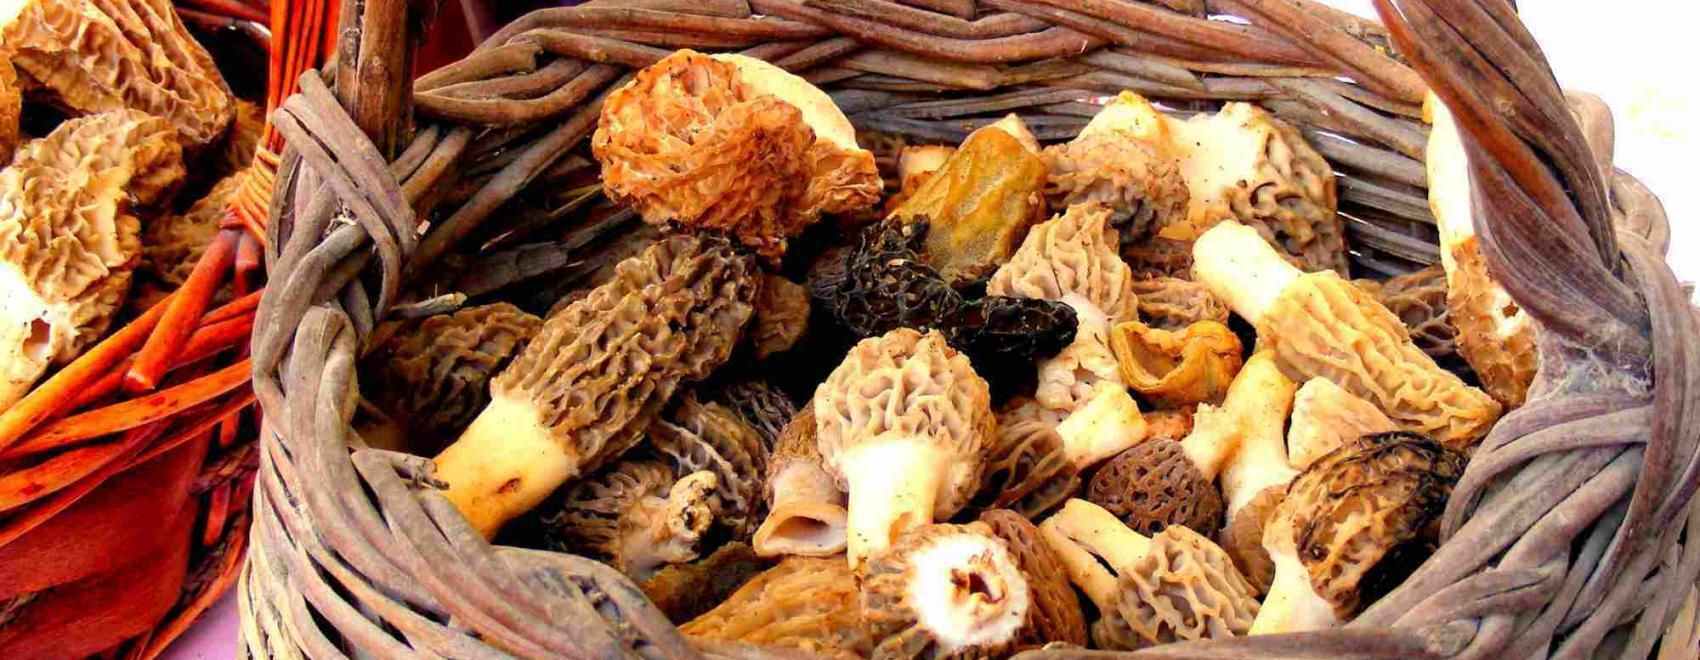 Crispy Fried Morel Mushrooms